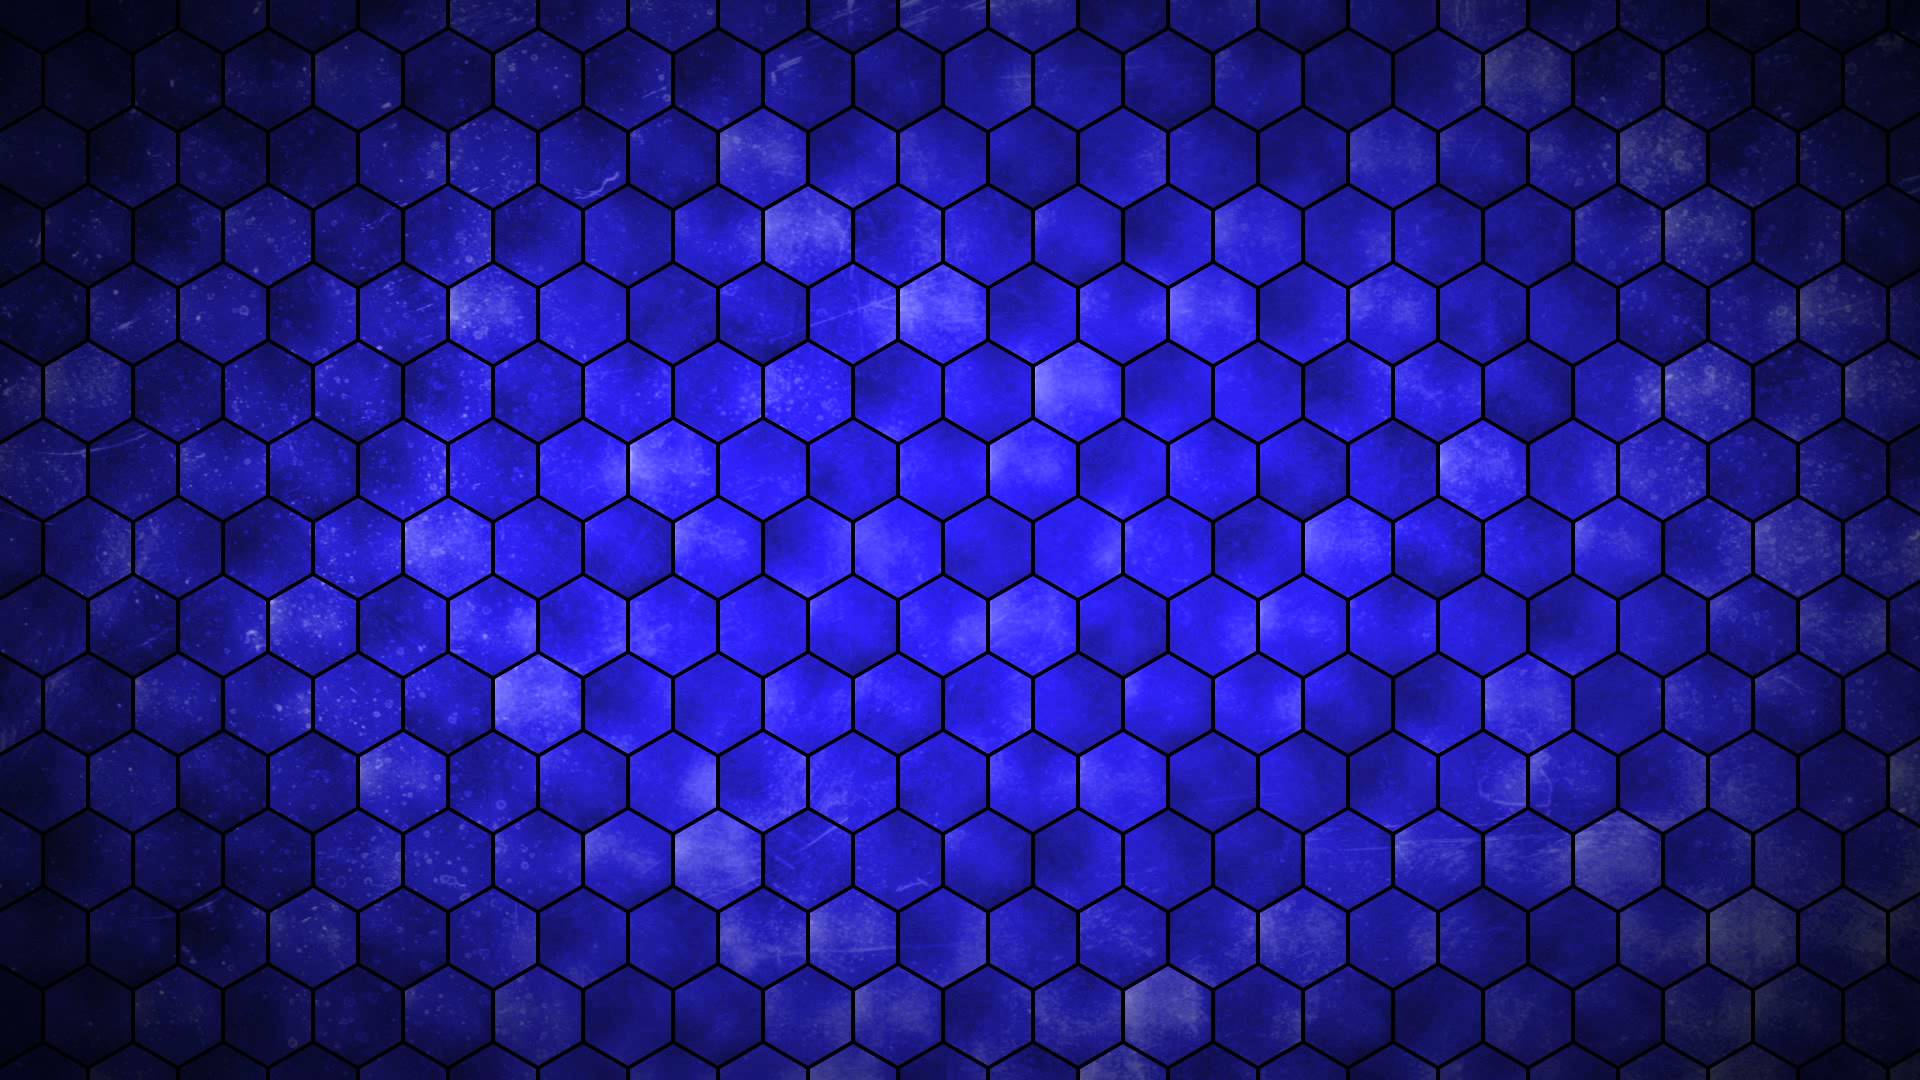 wallpaper blue hexagon white - photo #16